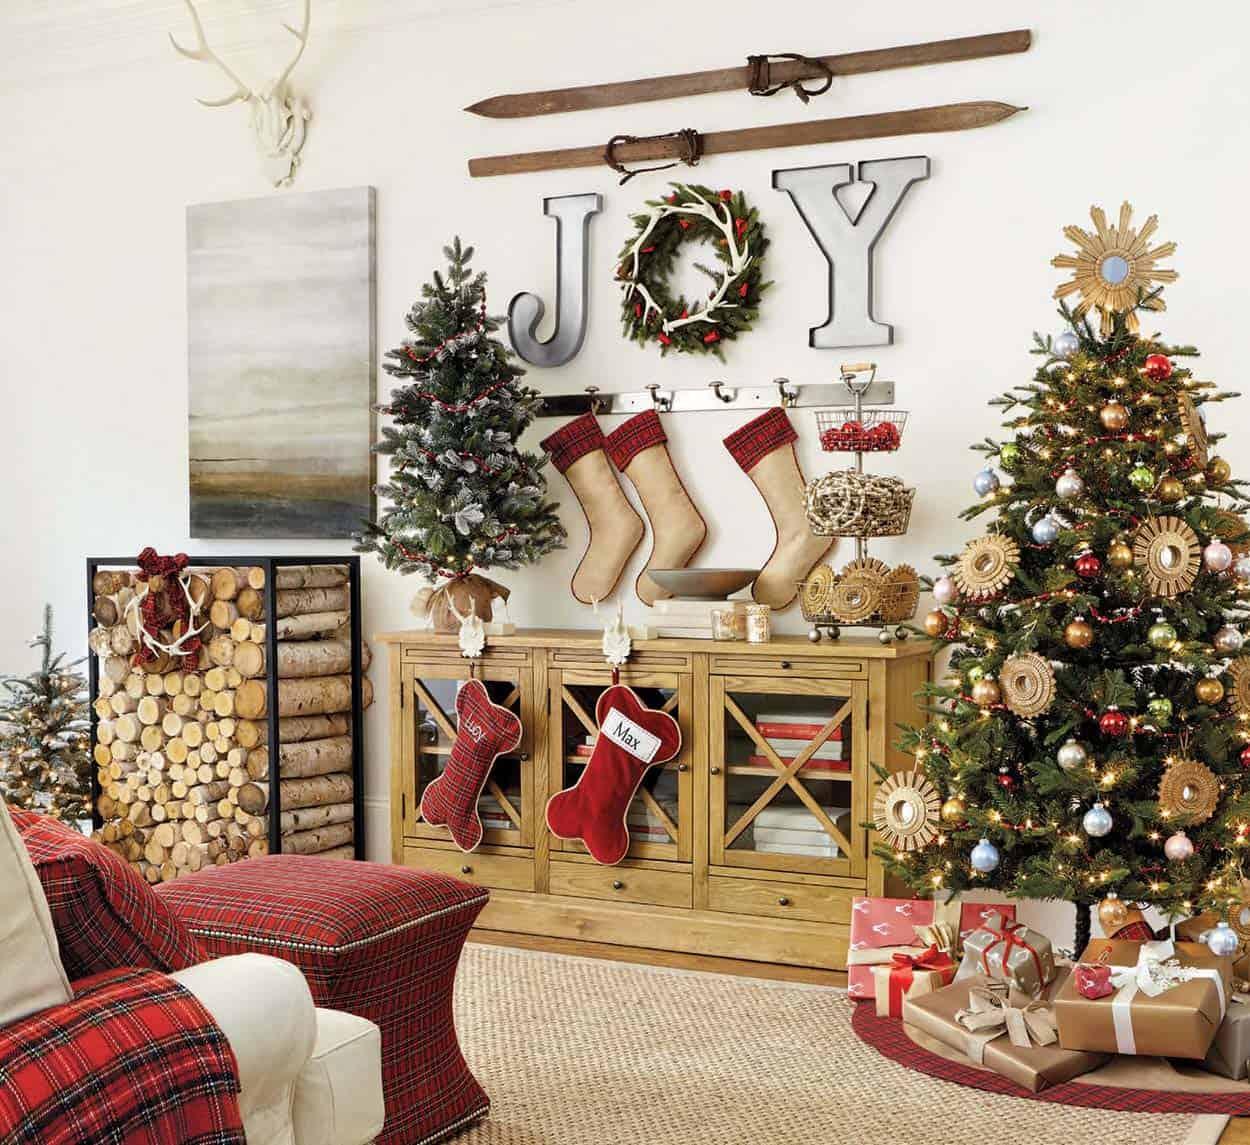 christmas-decor-ideas-rustic-country-16-1-kindesign